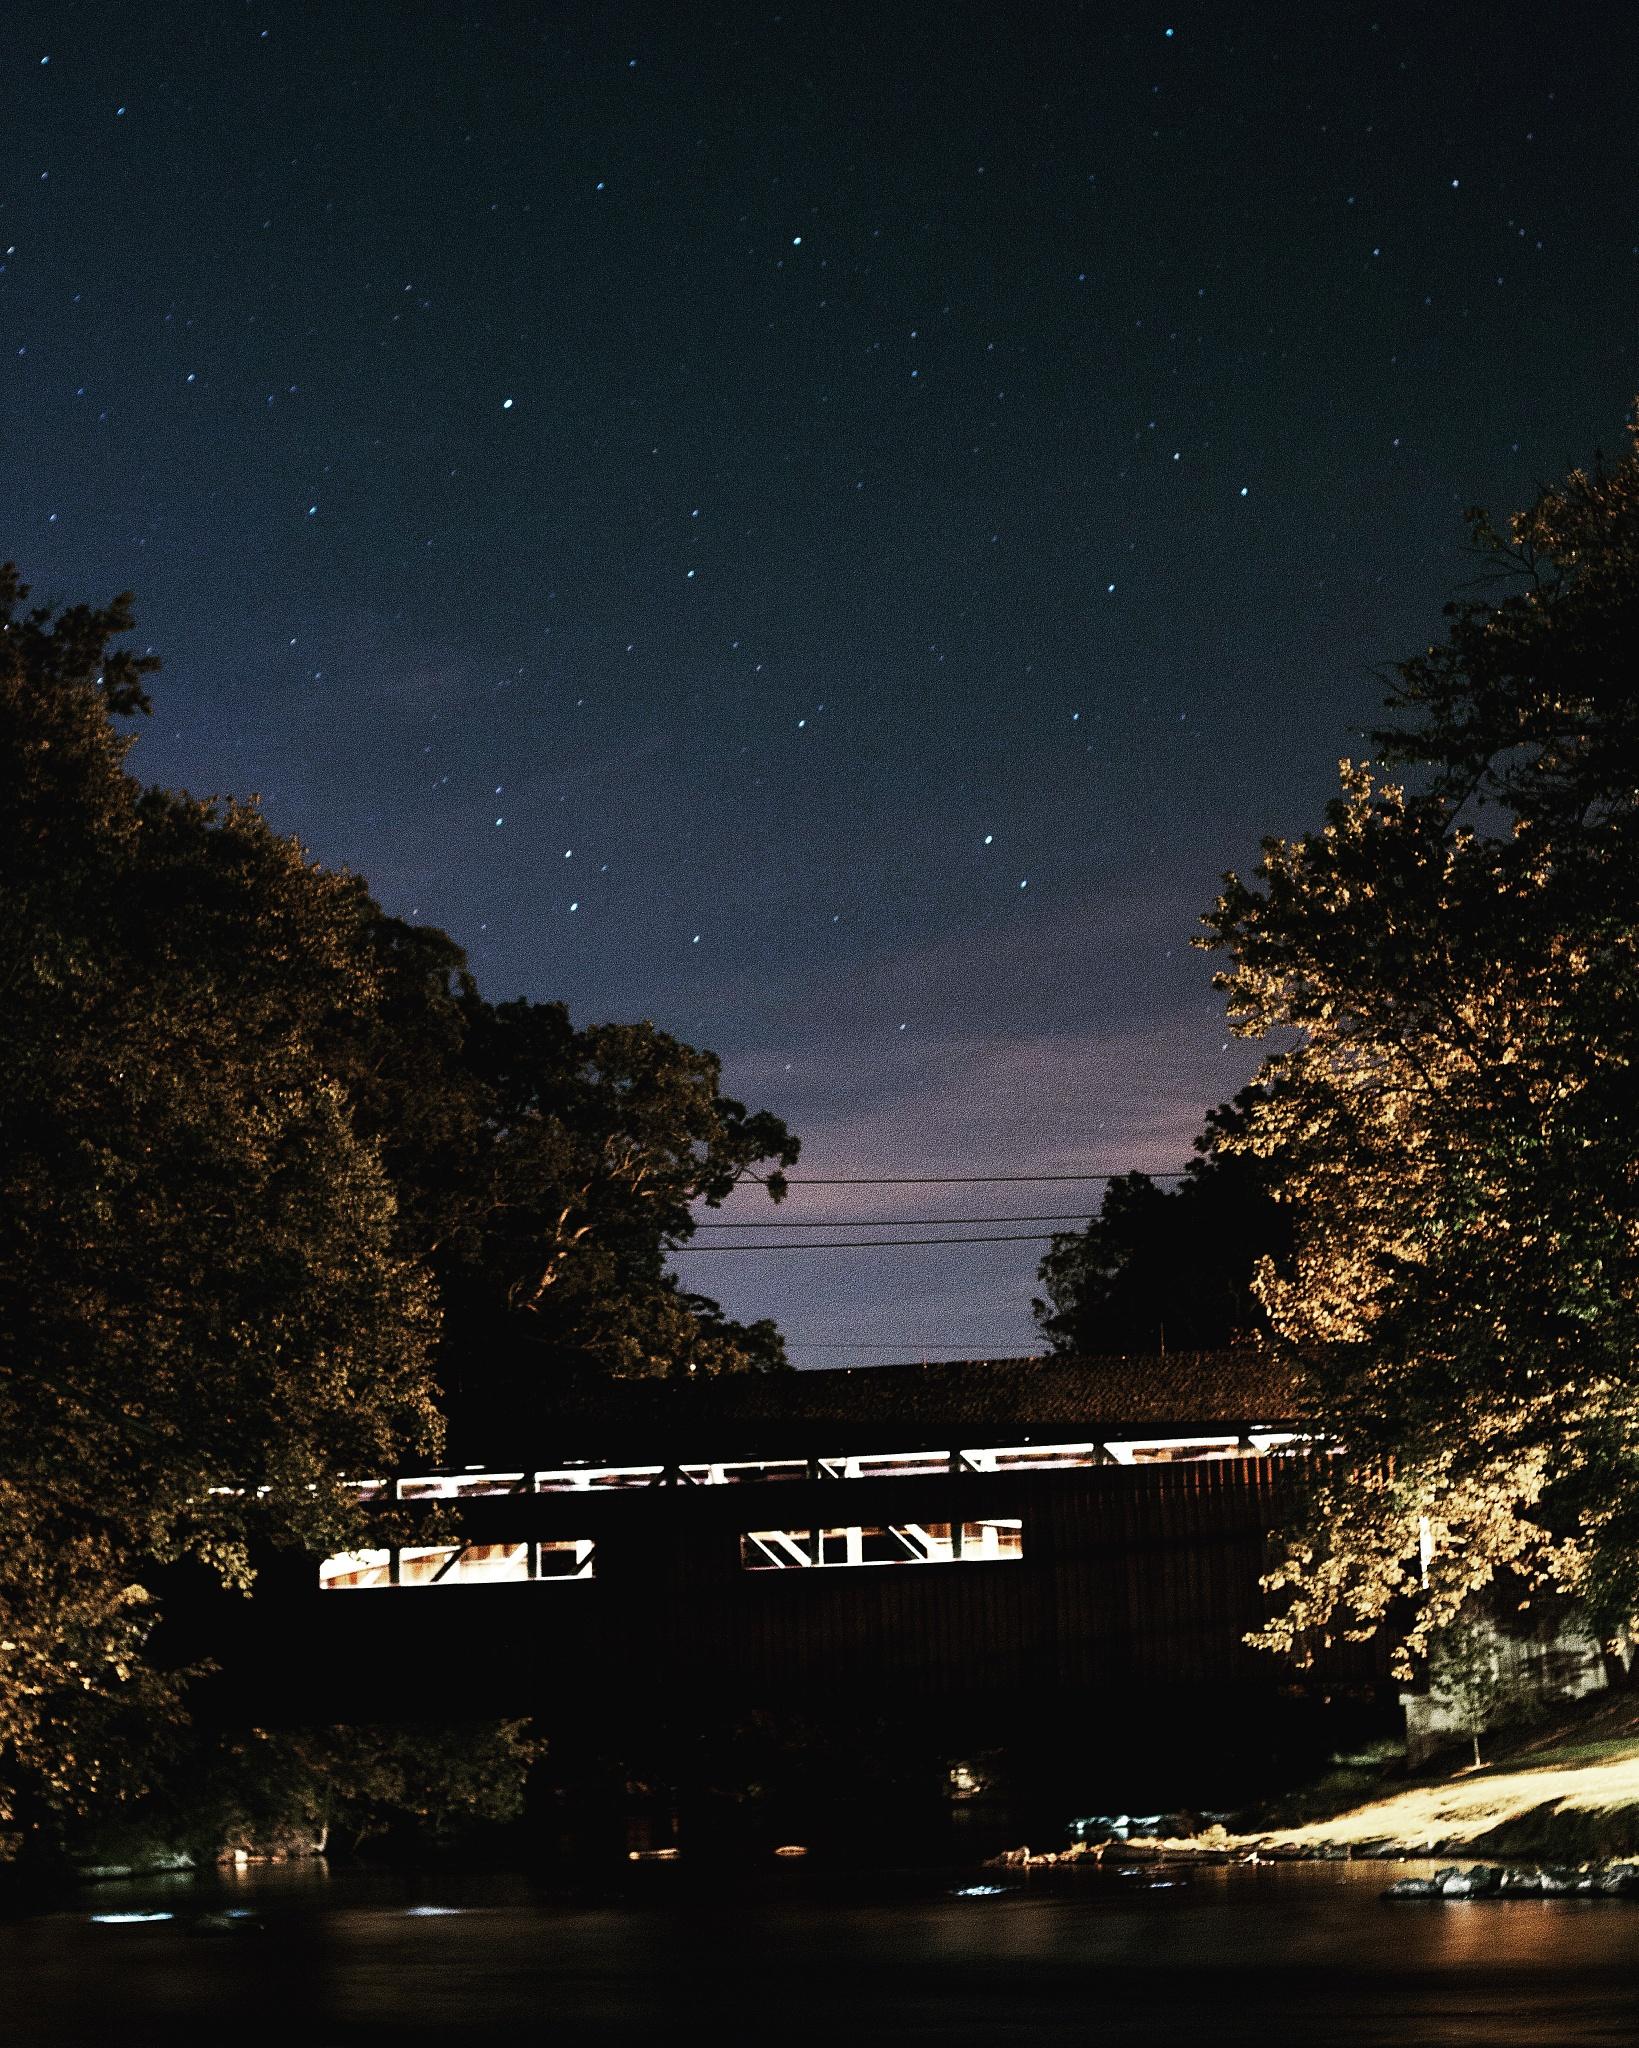 Bridges by Timothy Sarac